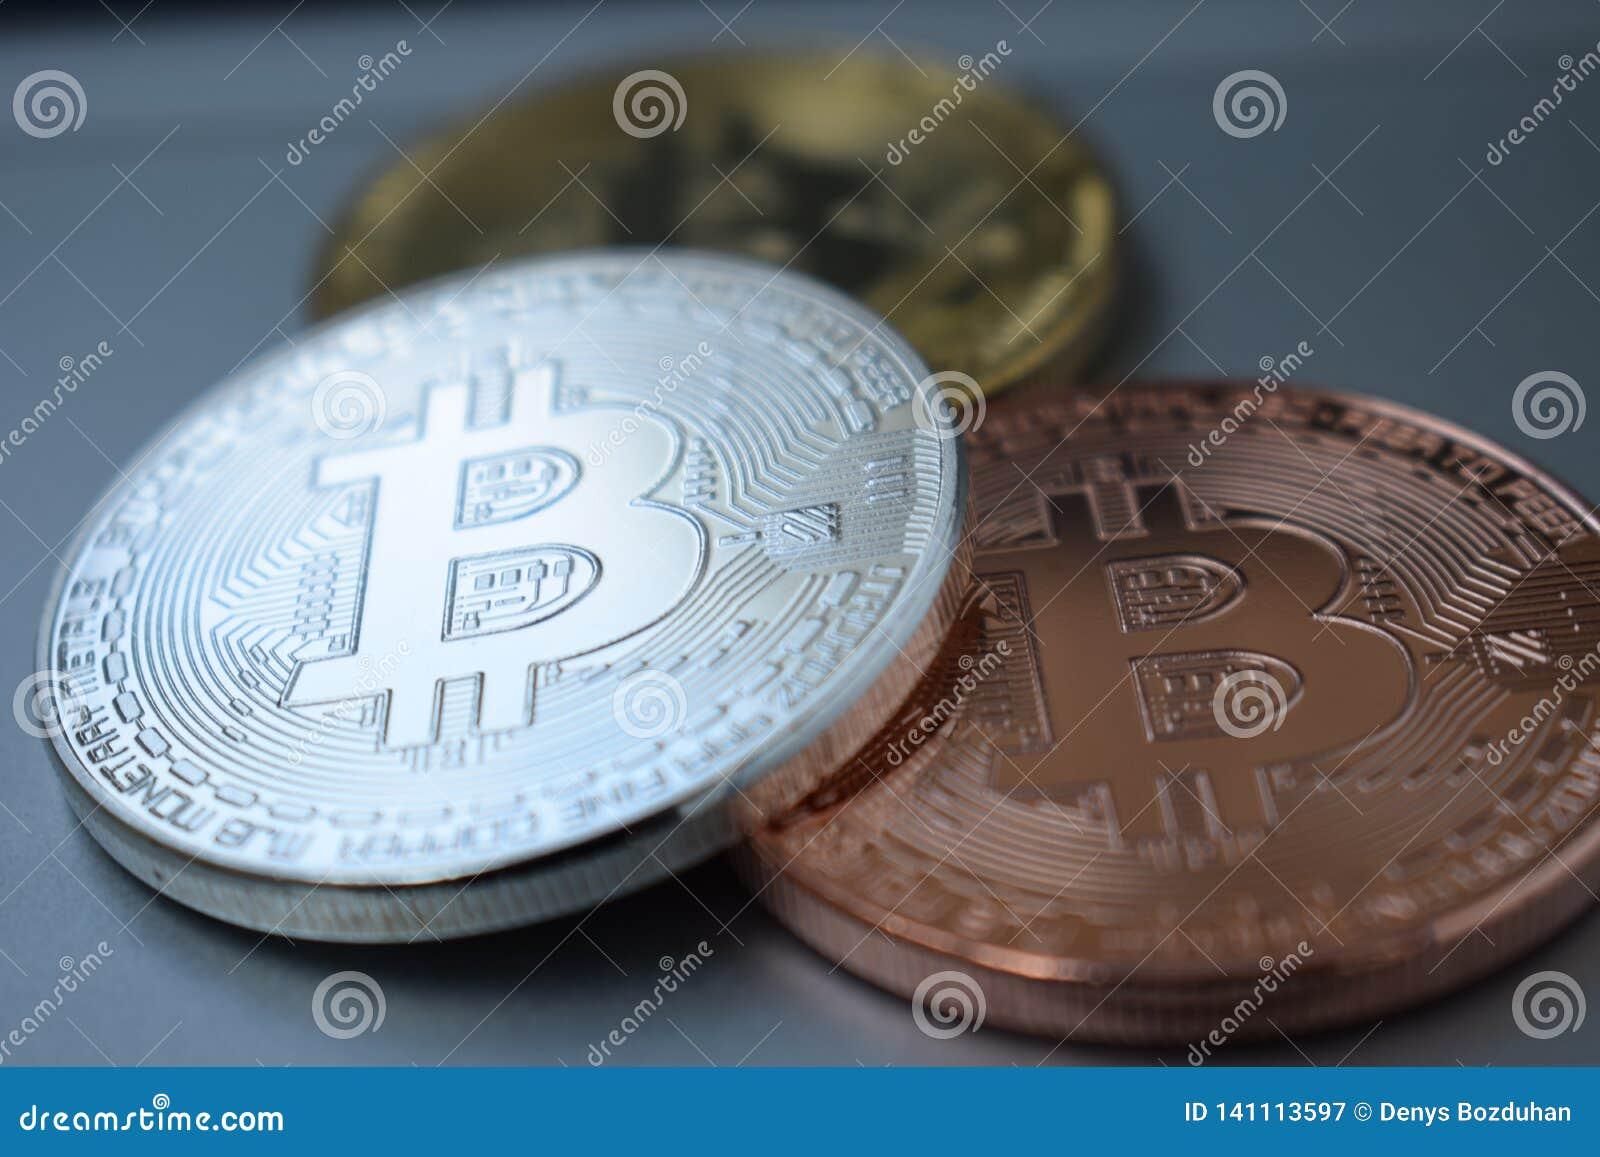 Золото 3 монеток, серебр, бронзовое Bitcoin Дело, коммерция, обмен